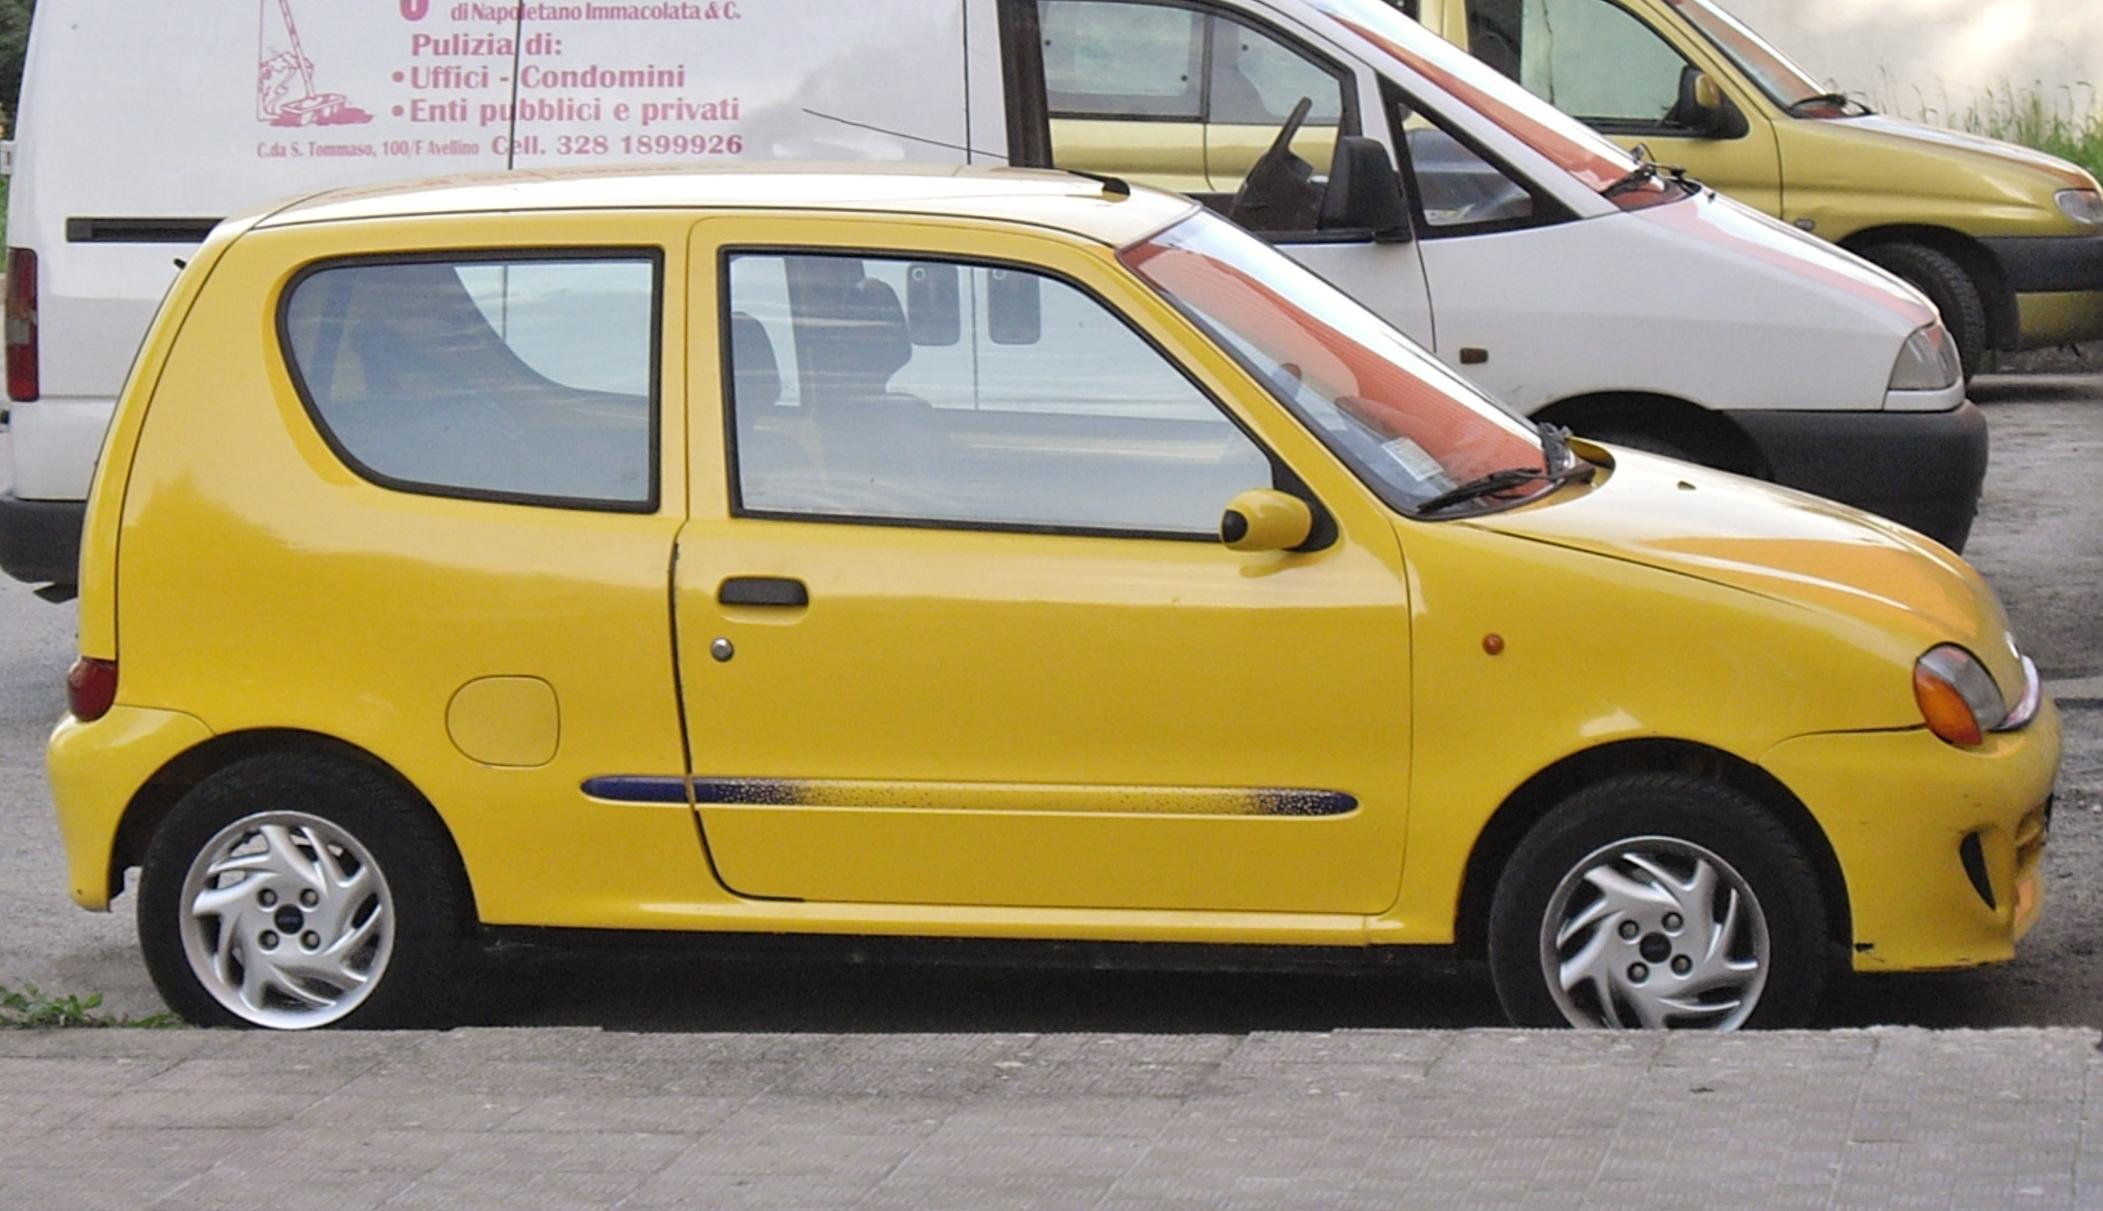 Fiat Seicento Sporting Yellow File:fiat Seicento Sporting